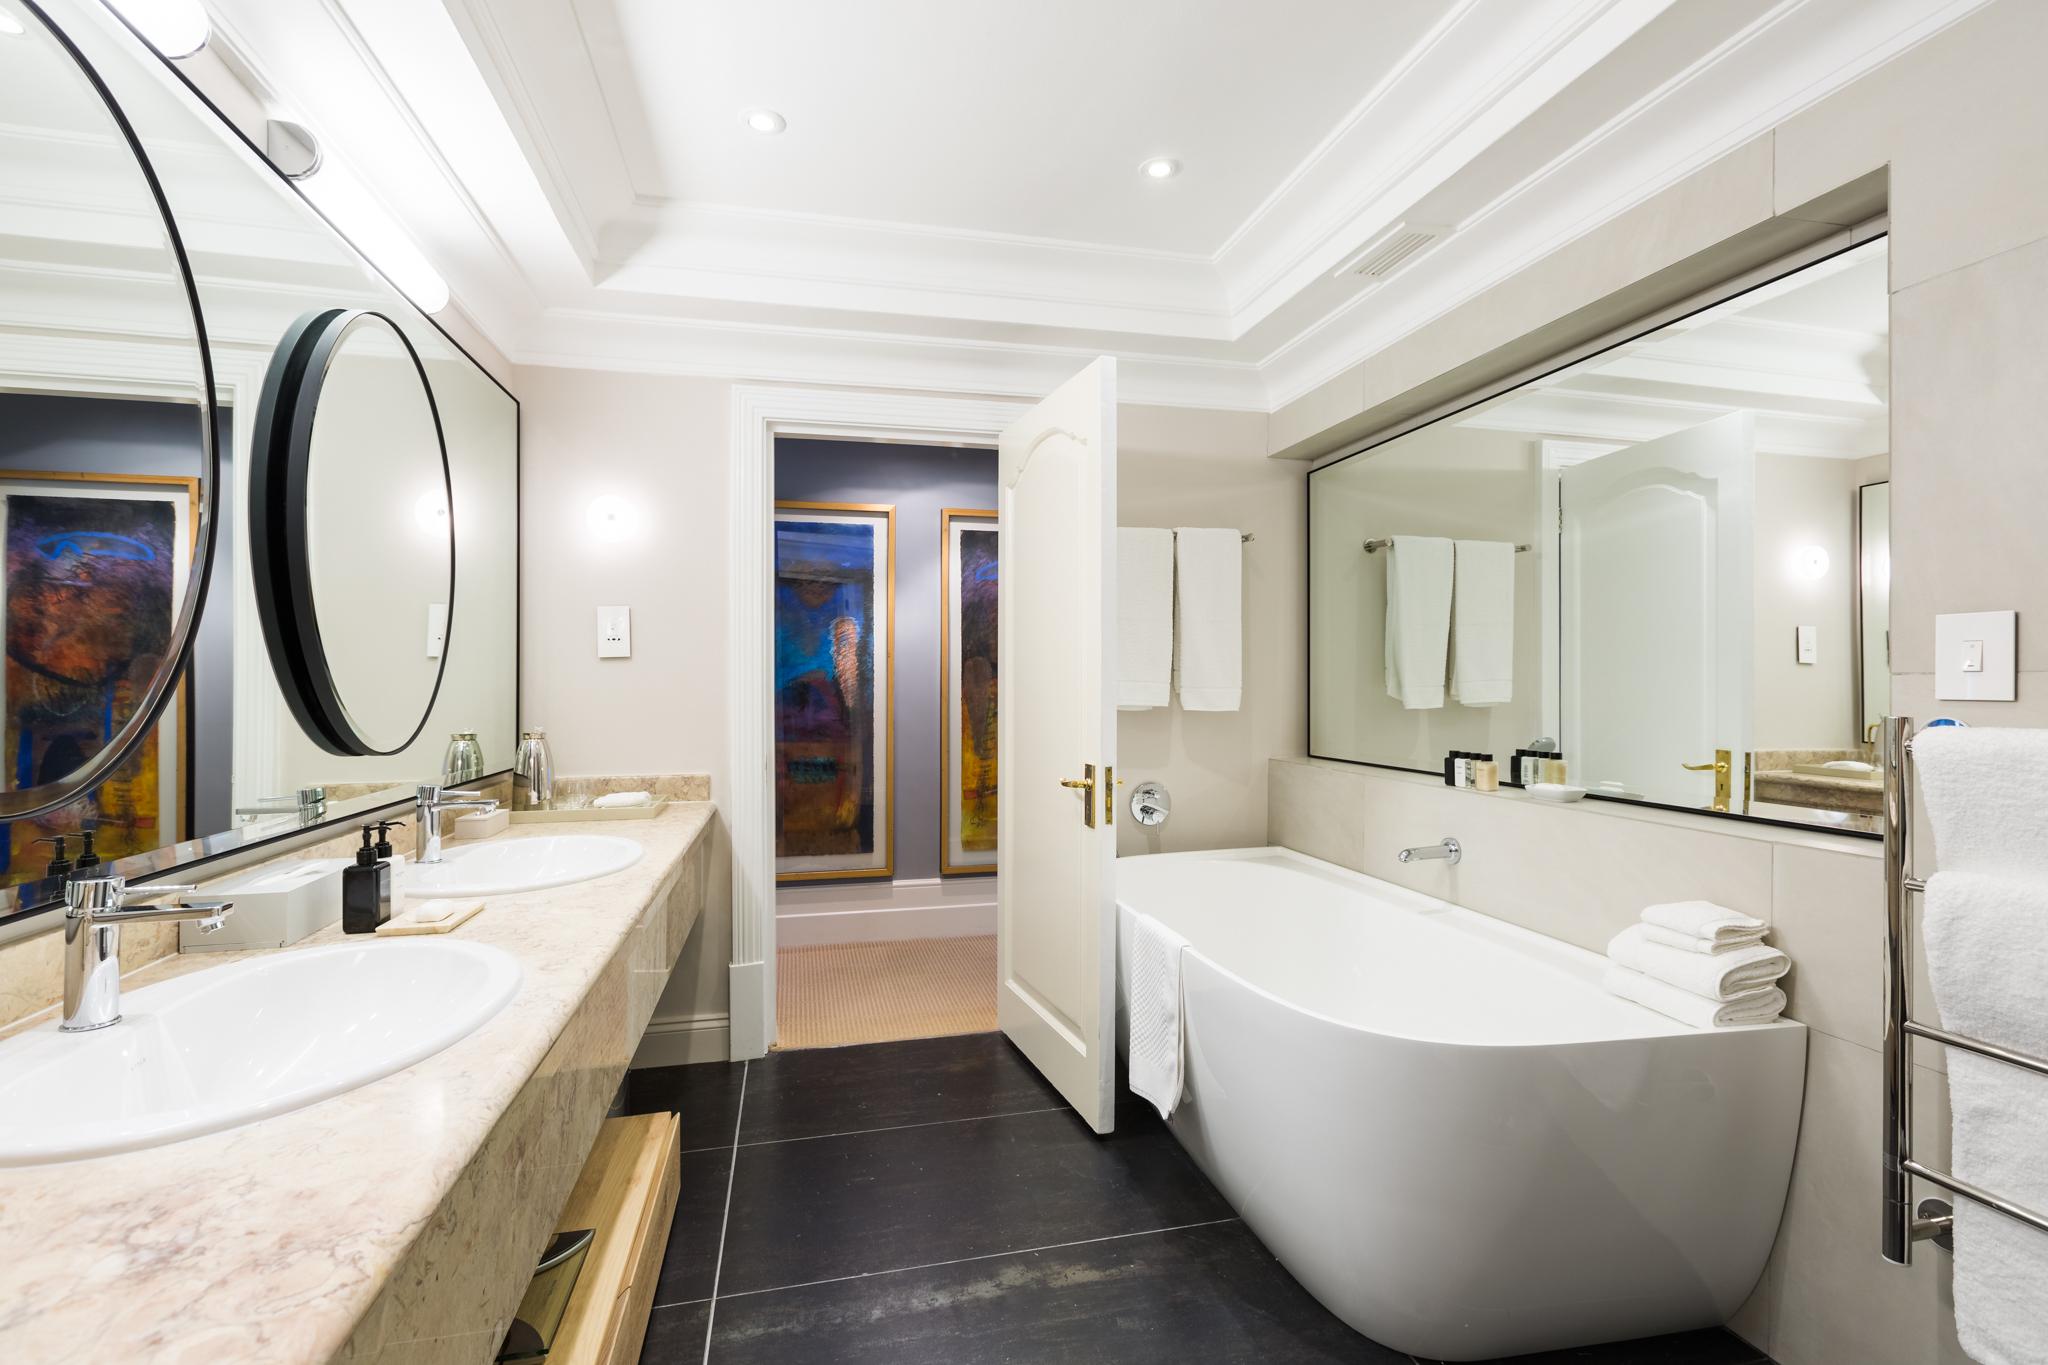 RM9 Bathroom HDR 1 2048px 5D3_5926-HDR.jpg